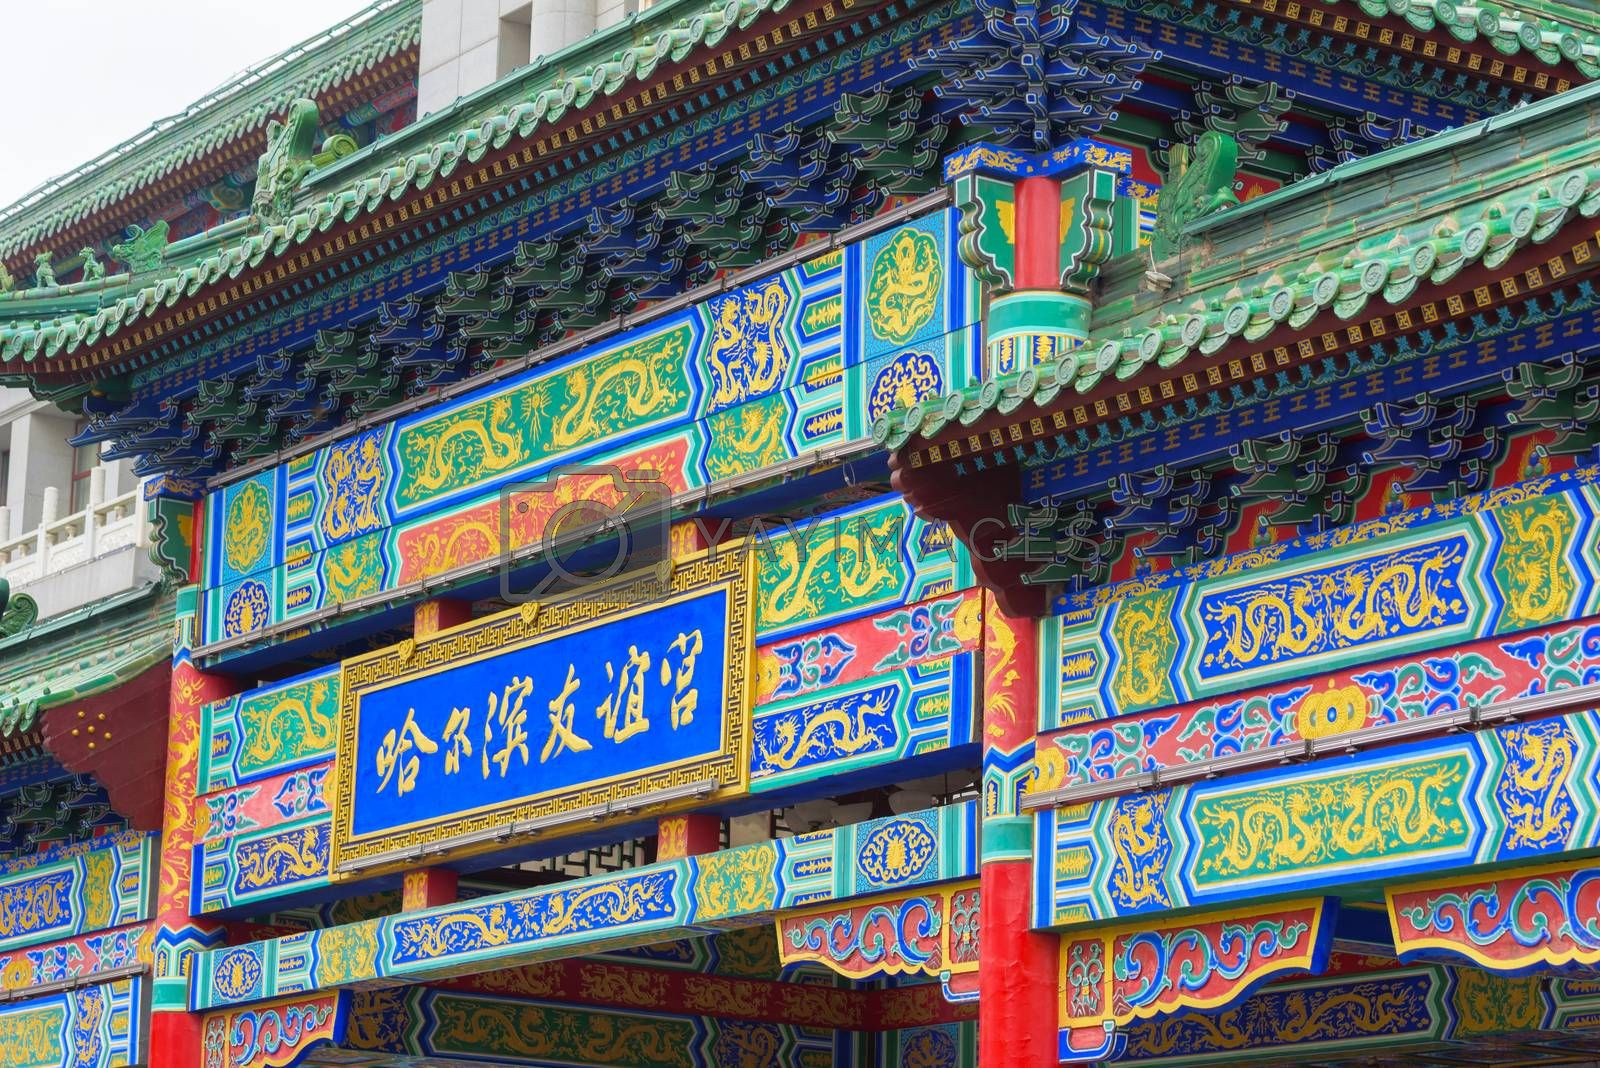 Harbin, Heilongjiang, China - September 2018: Facade of a Chinese building. House china